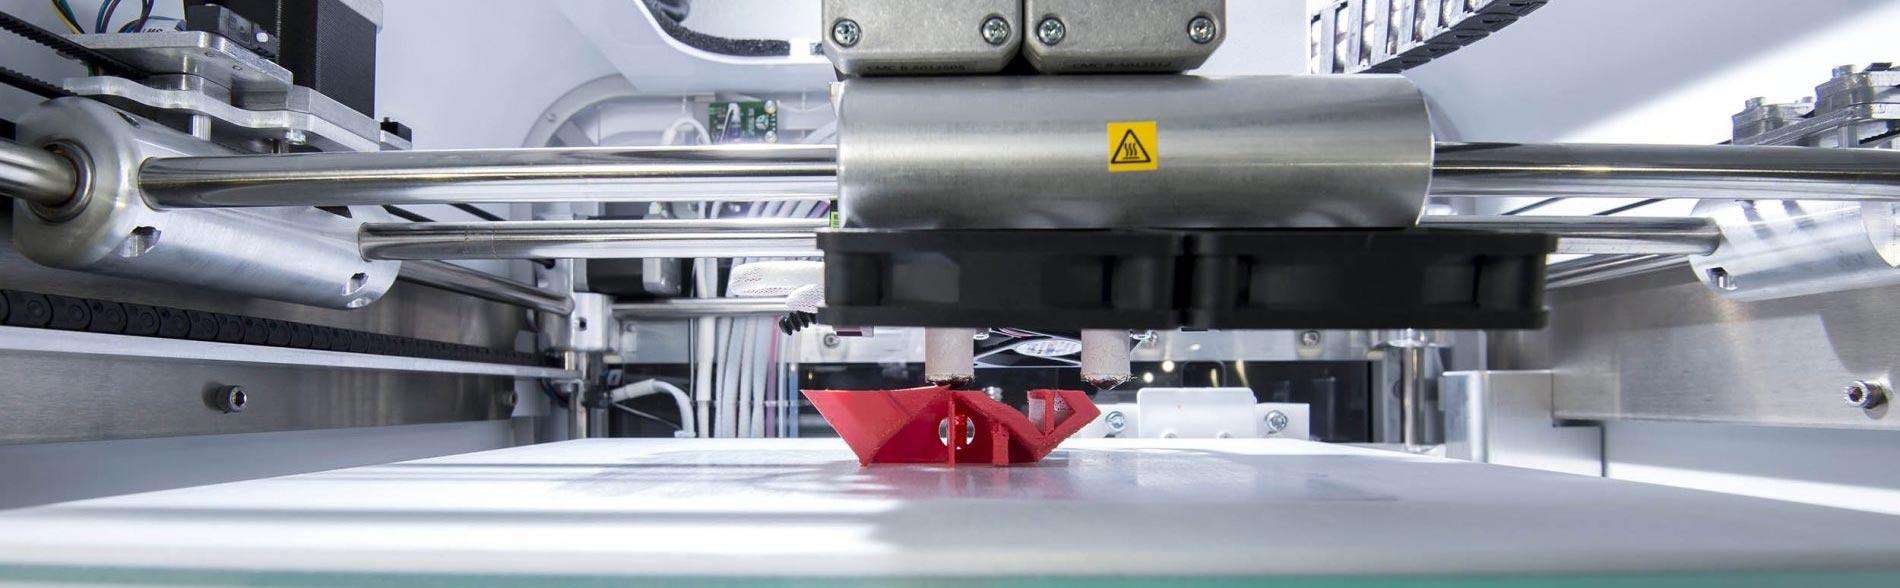 Impresora 3D para industria